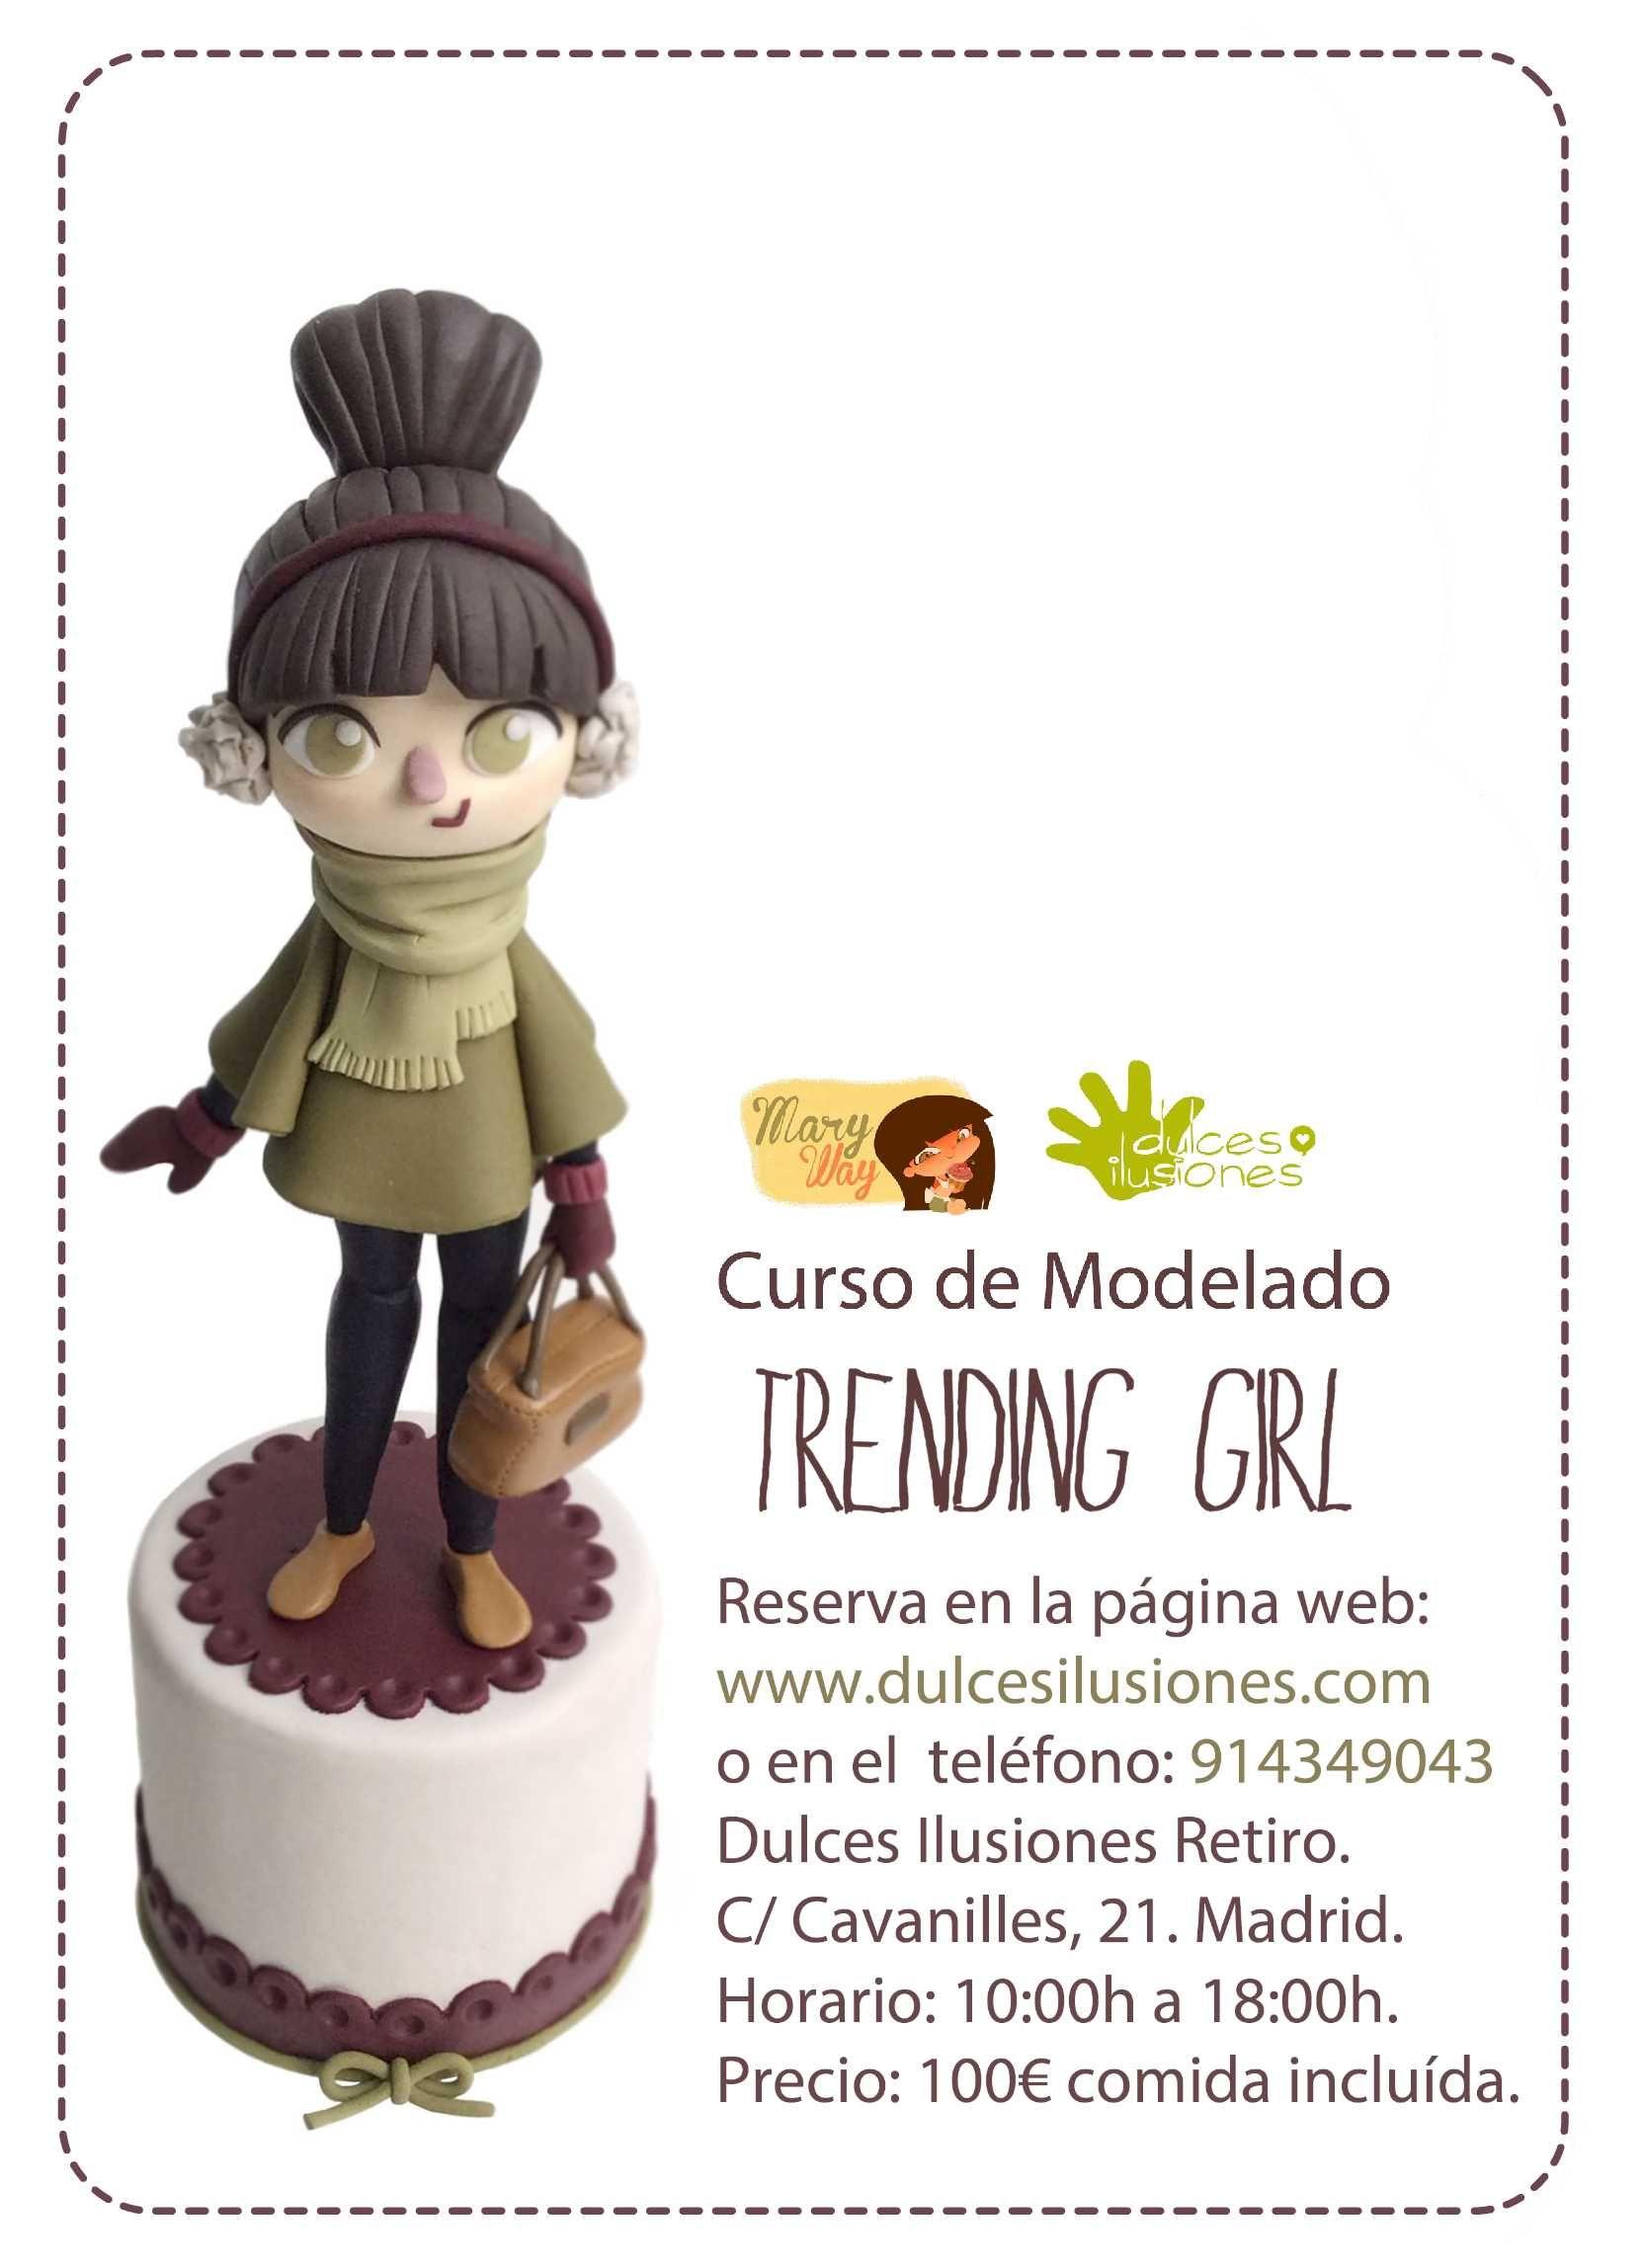 Tarta Fondant Tartas Fondant Cupcakes Ilustratartas Maryway Tartas Exclusivas Pasteleria Creativa Tortas Tartas